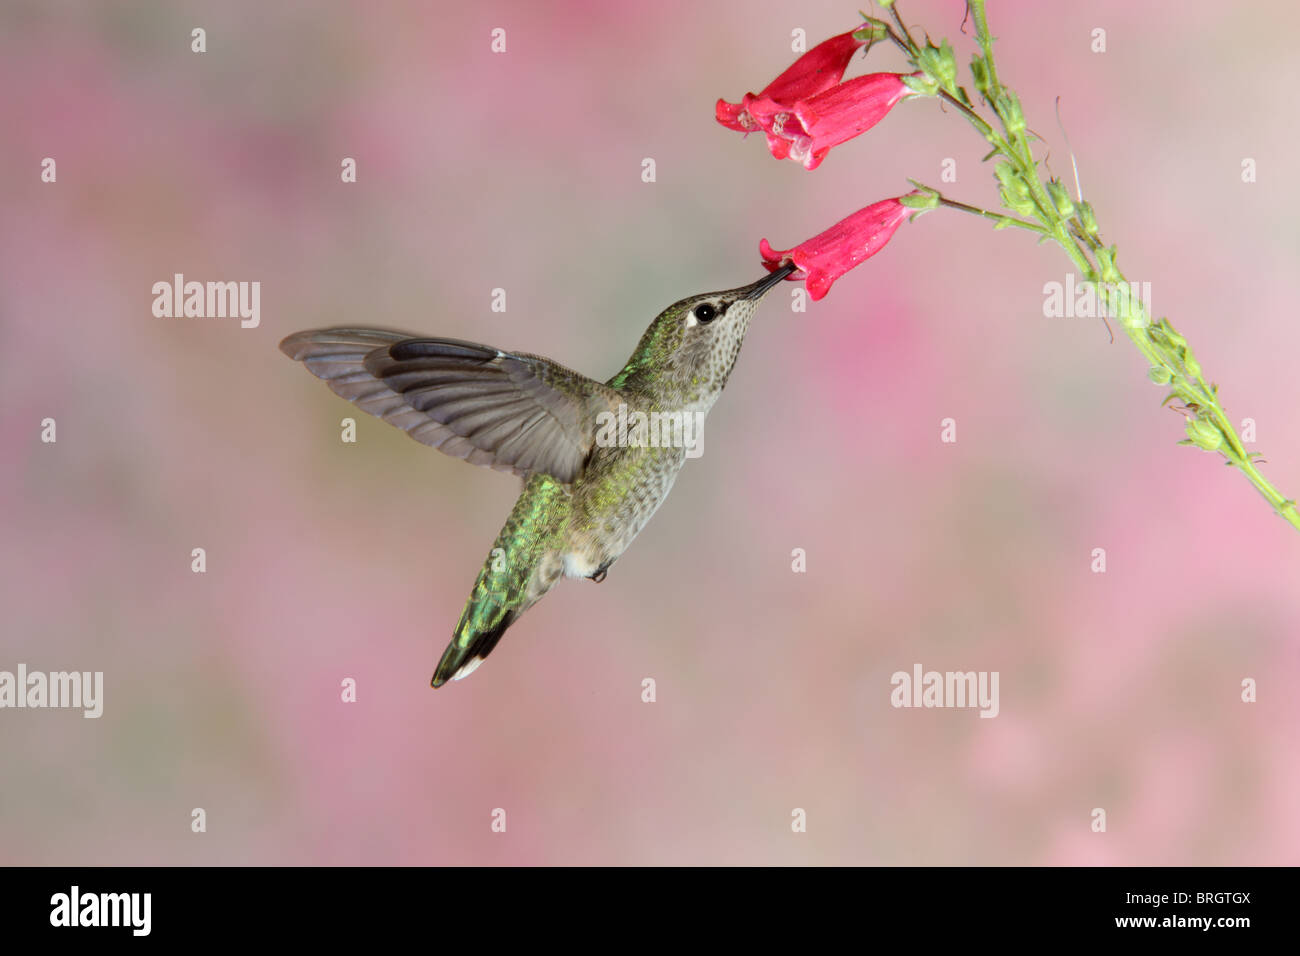 Anna's Hummingbird Adult Female feeding at Penstemon flower. - Stock Image